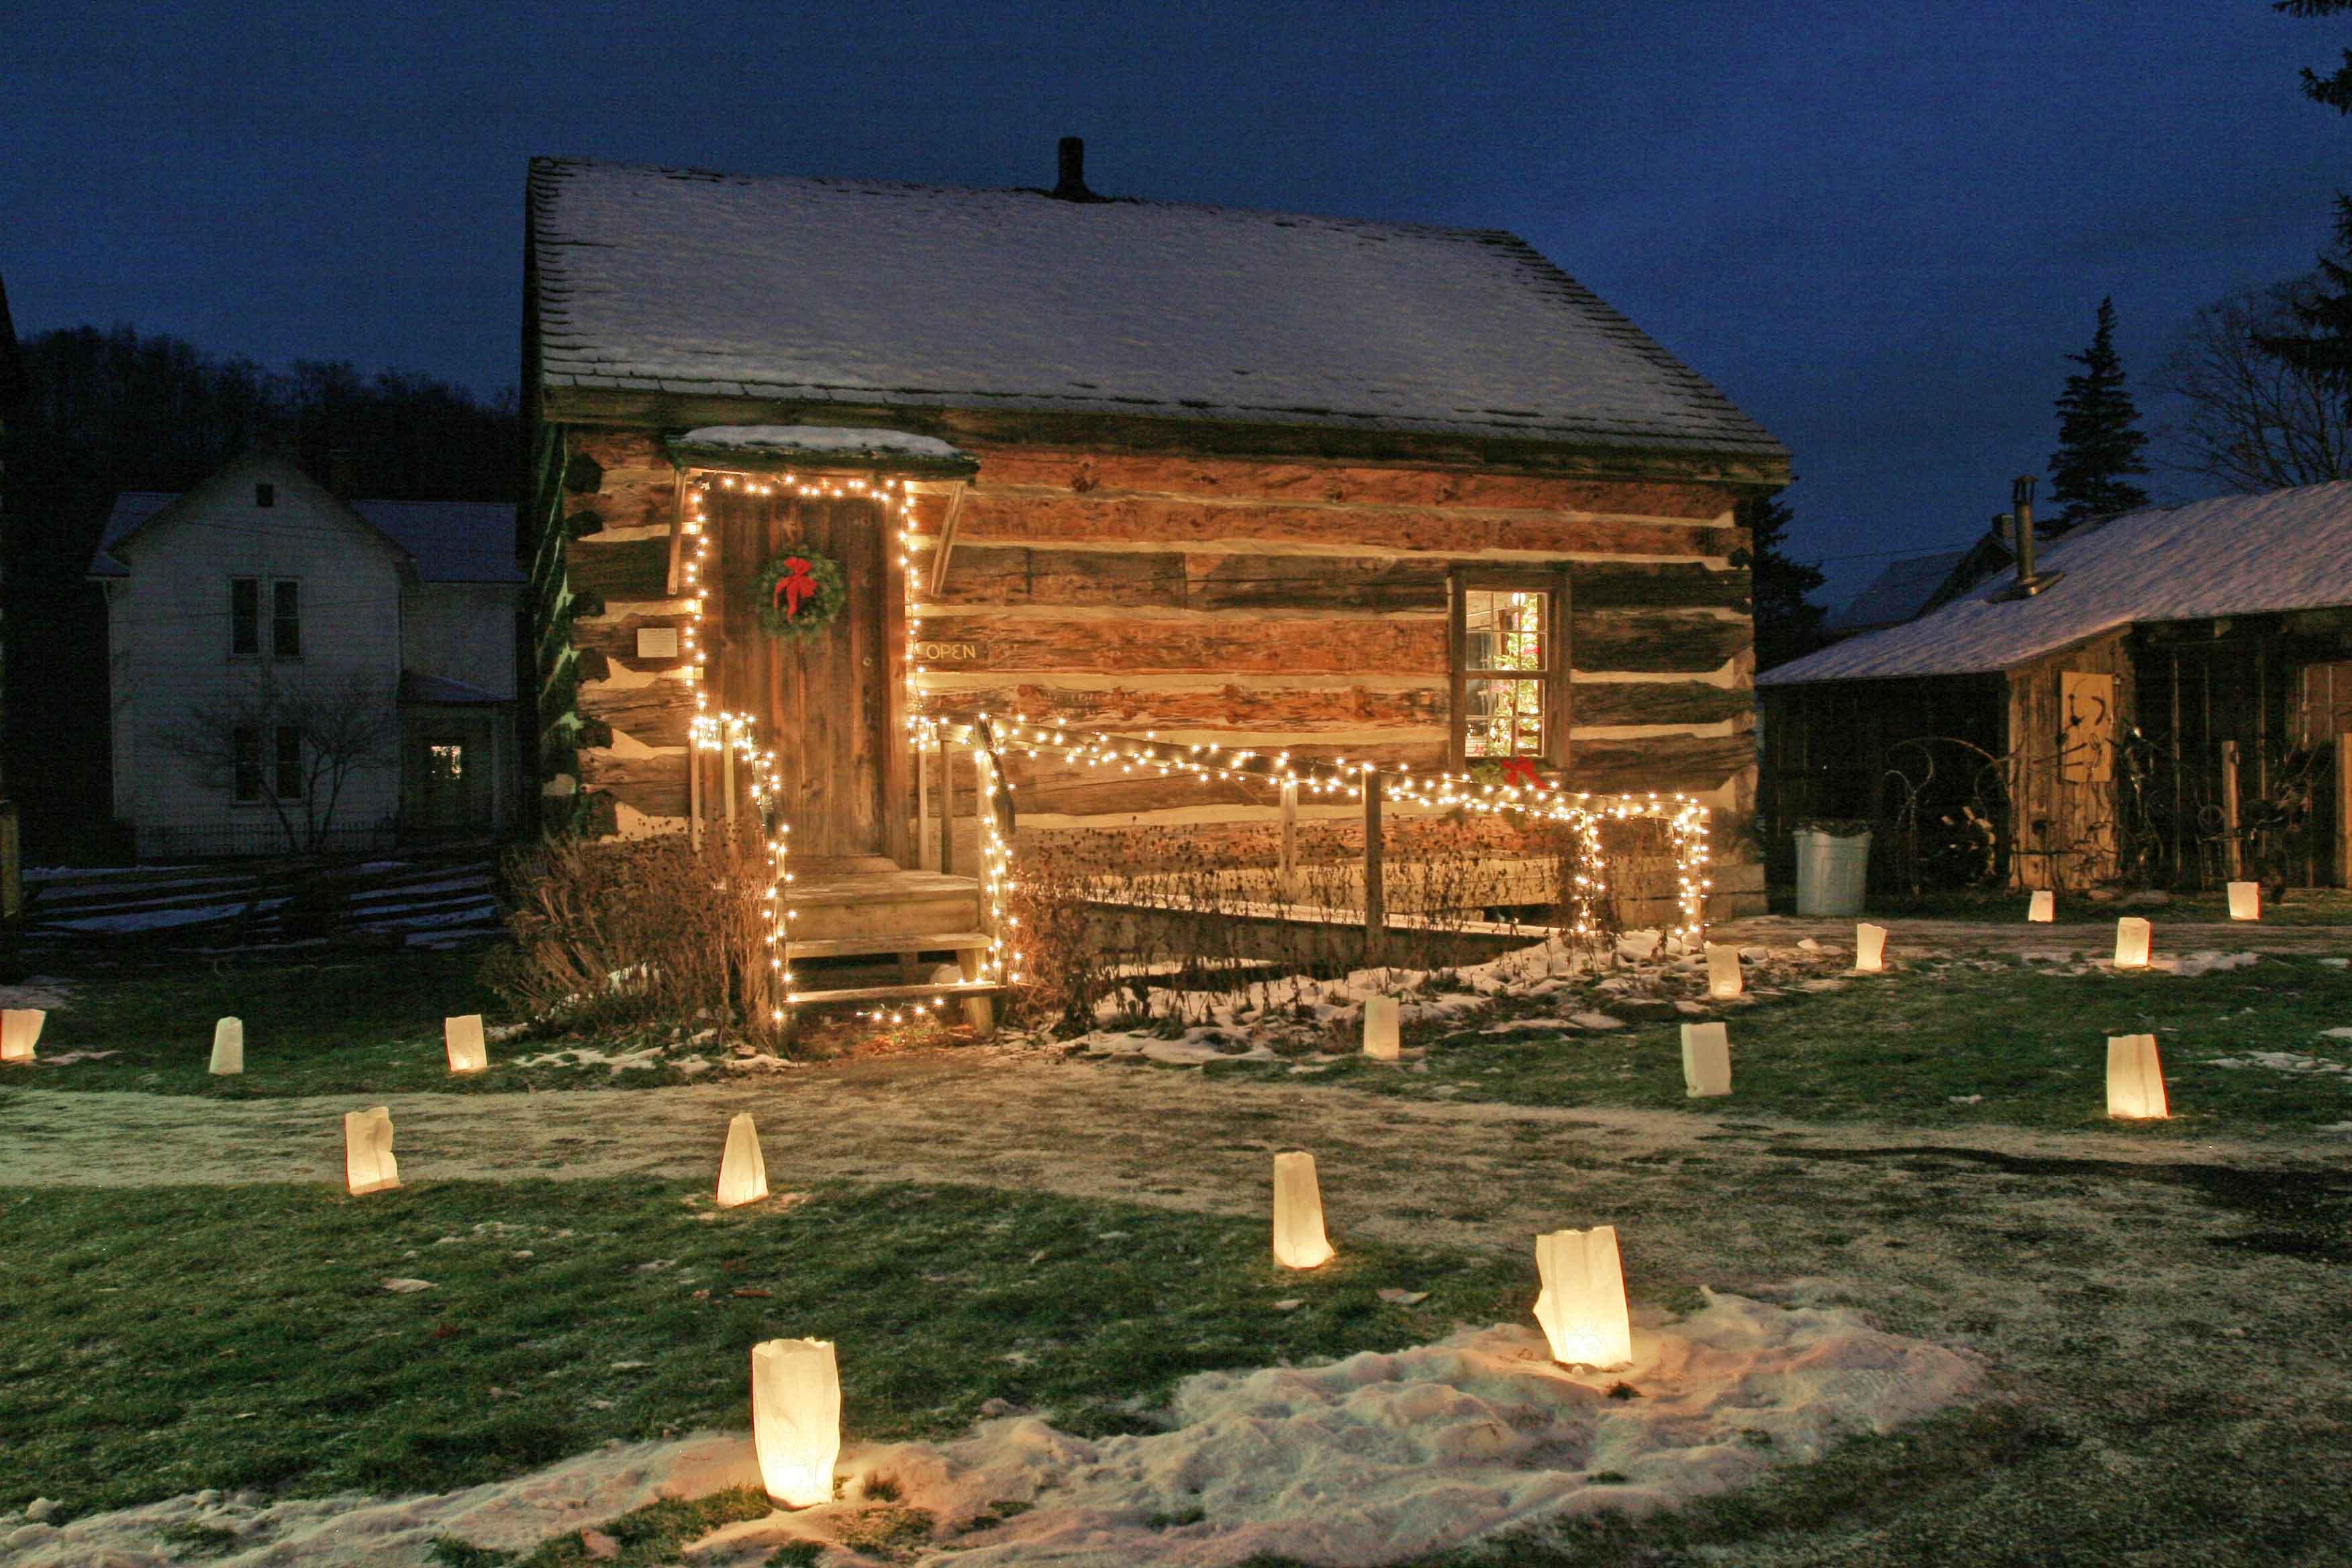 Spruce Forest Artisan Village with luminaries